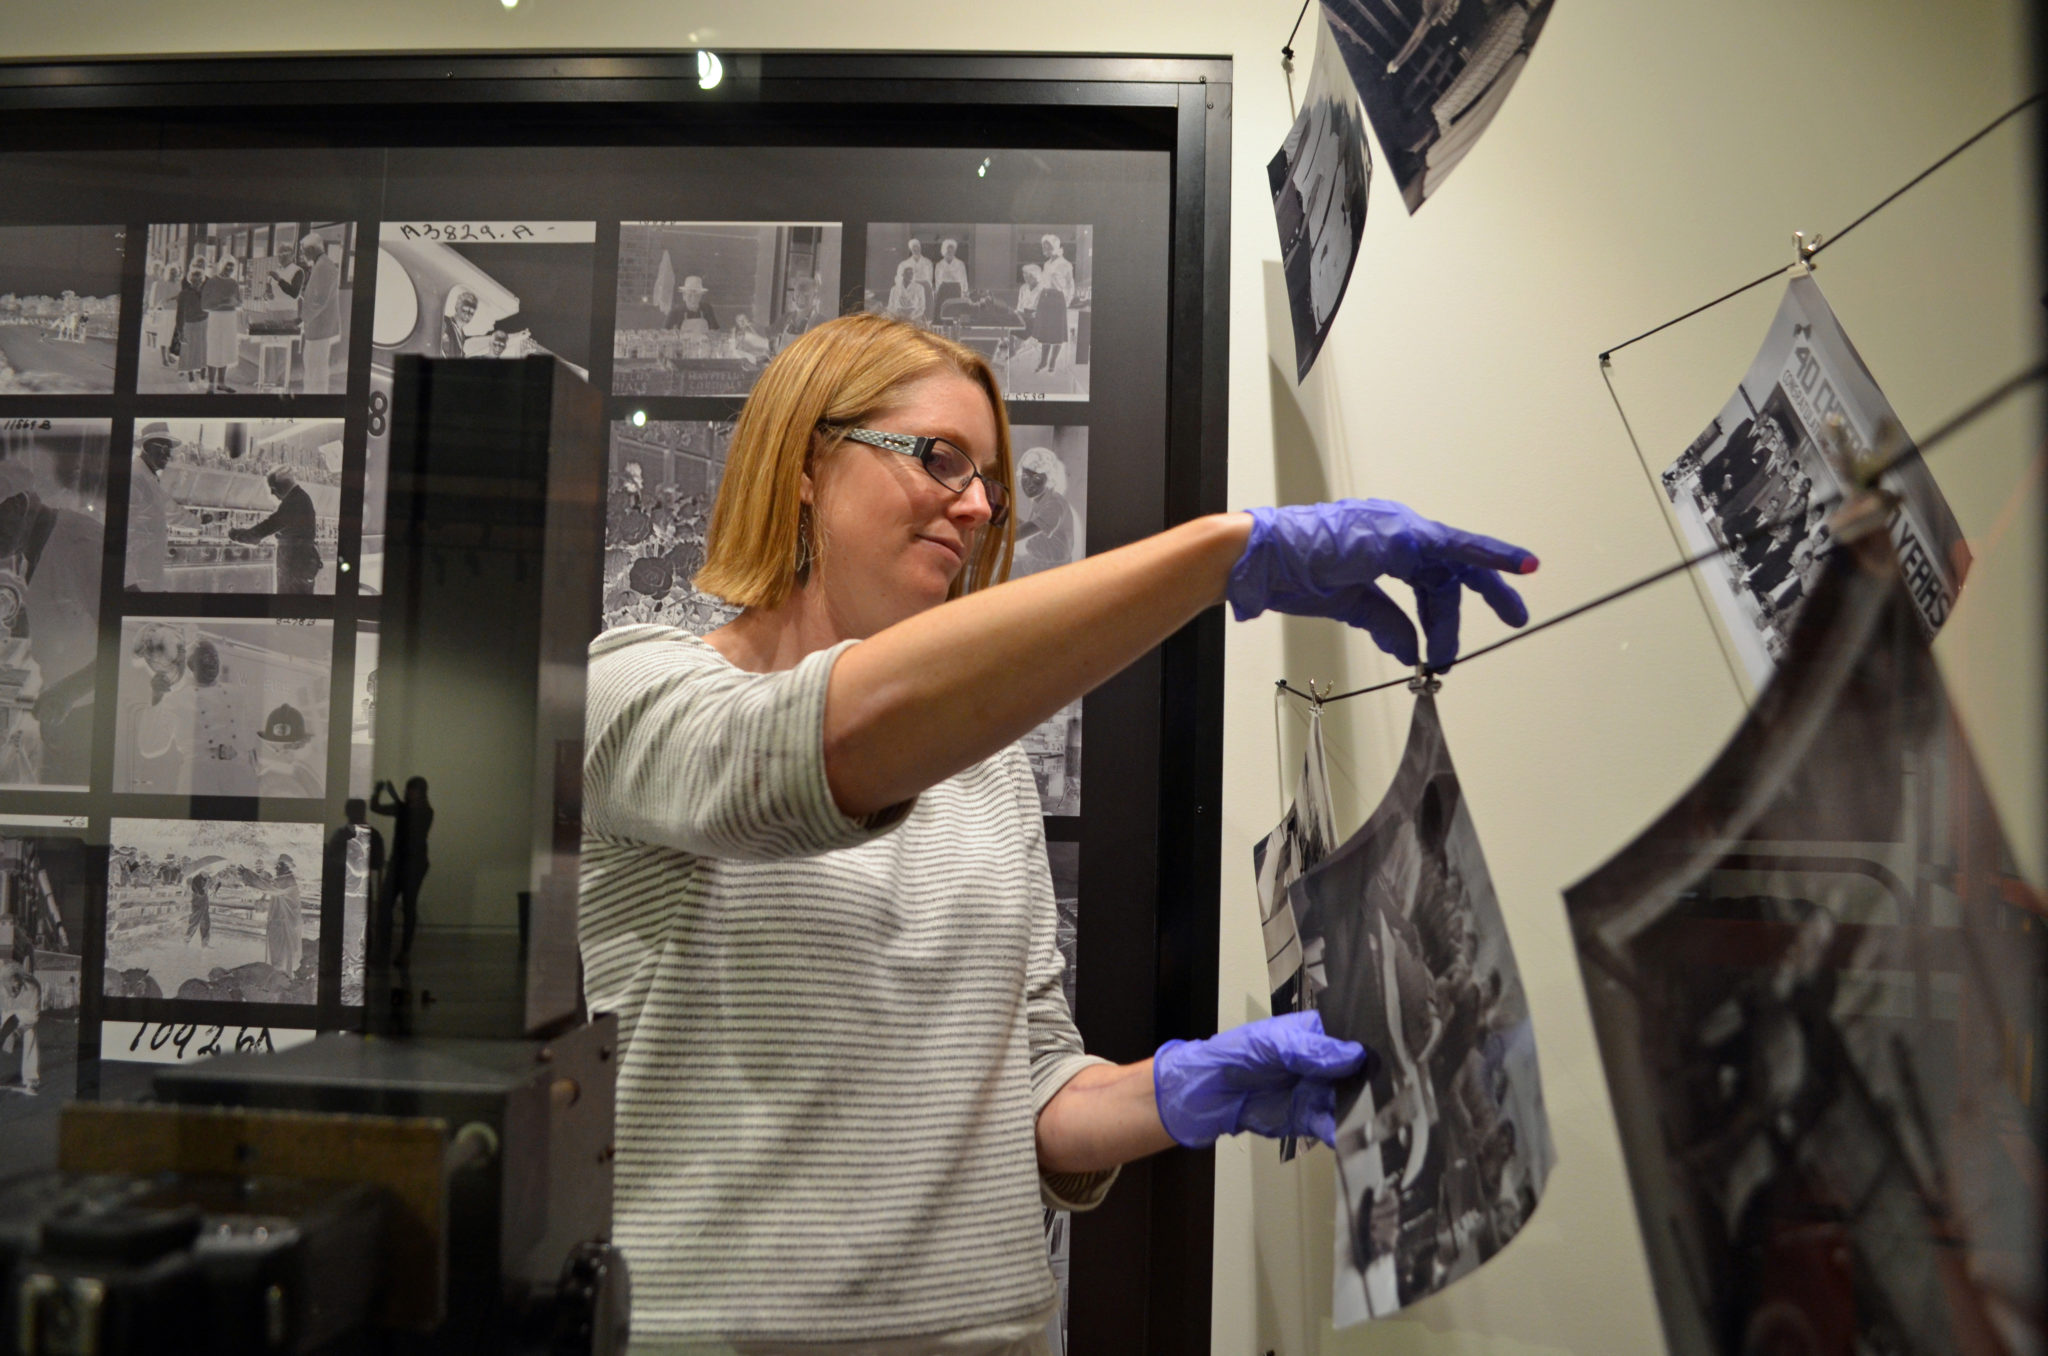 Woman placing photos on display